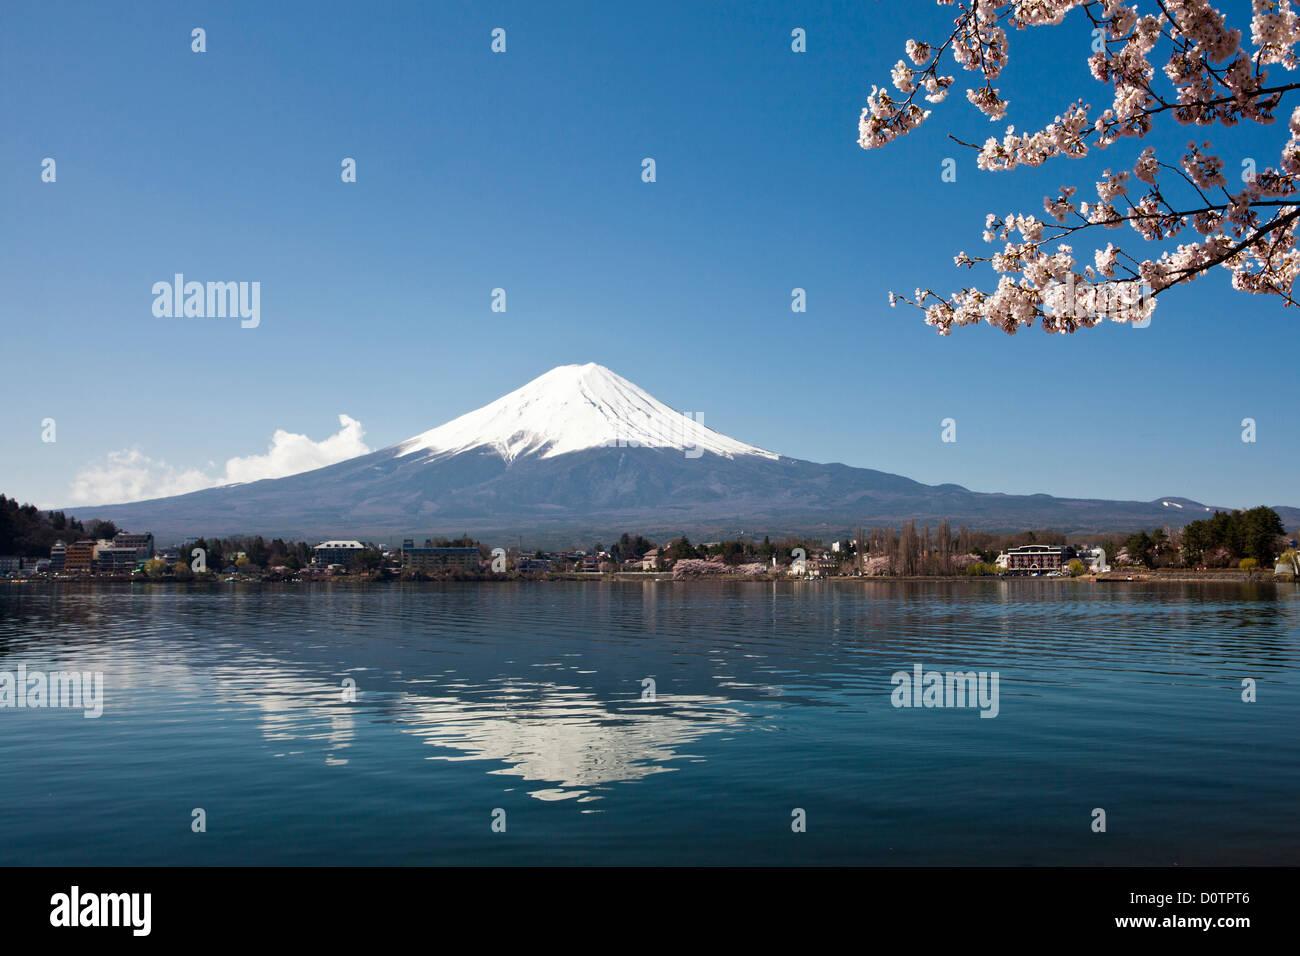 Japan, Asia, holiday, travel, Cherry blossoms, Yamaguchi, lake, Fuji, Mount Fuji, Fujiyama, landscape, mountain, snow, spring, v Stock Photo